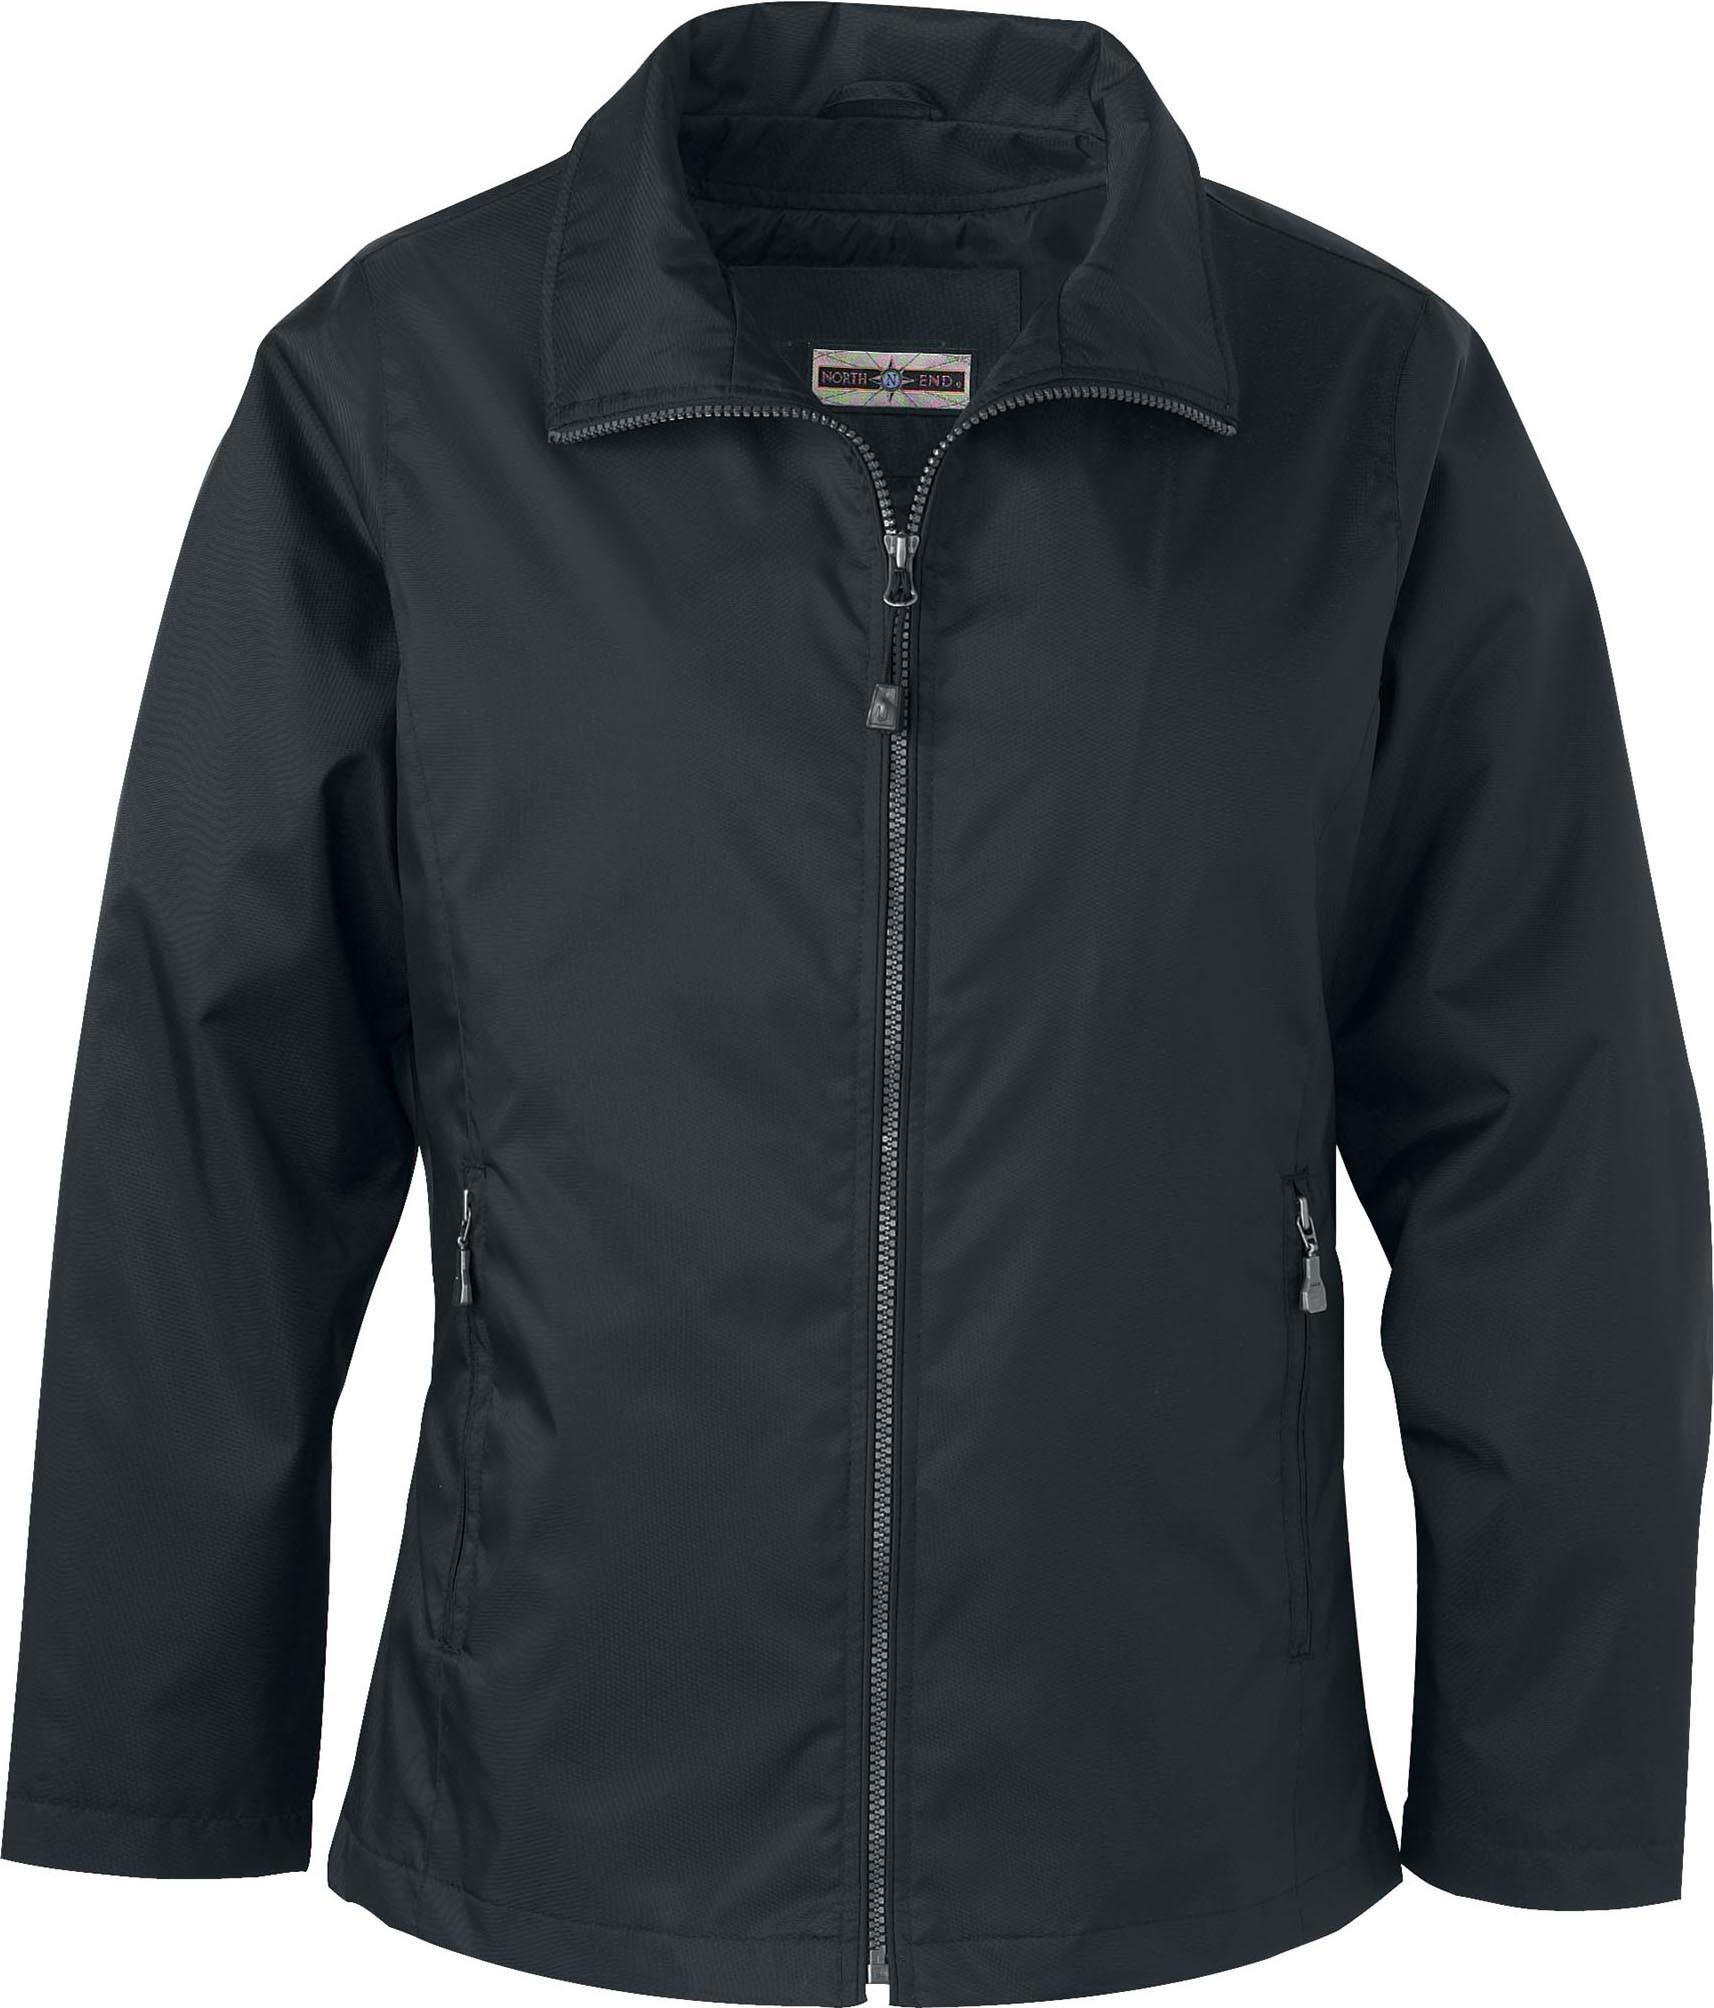 Ash City Lightweight 78007 - Ladies' Oxford Jacket